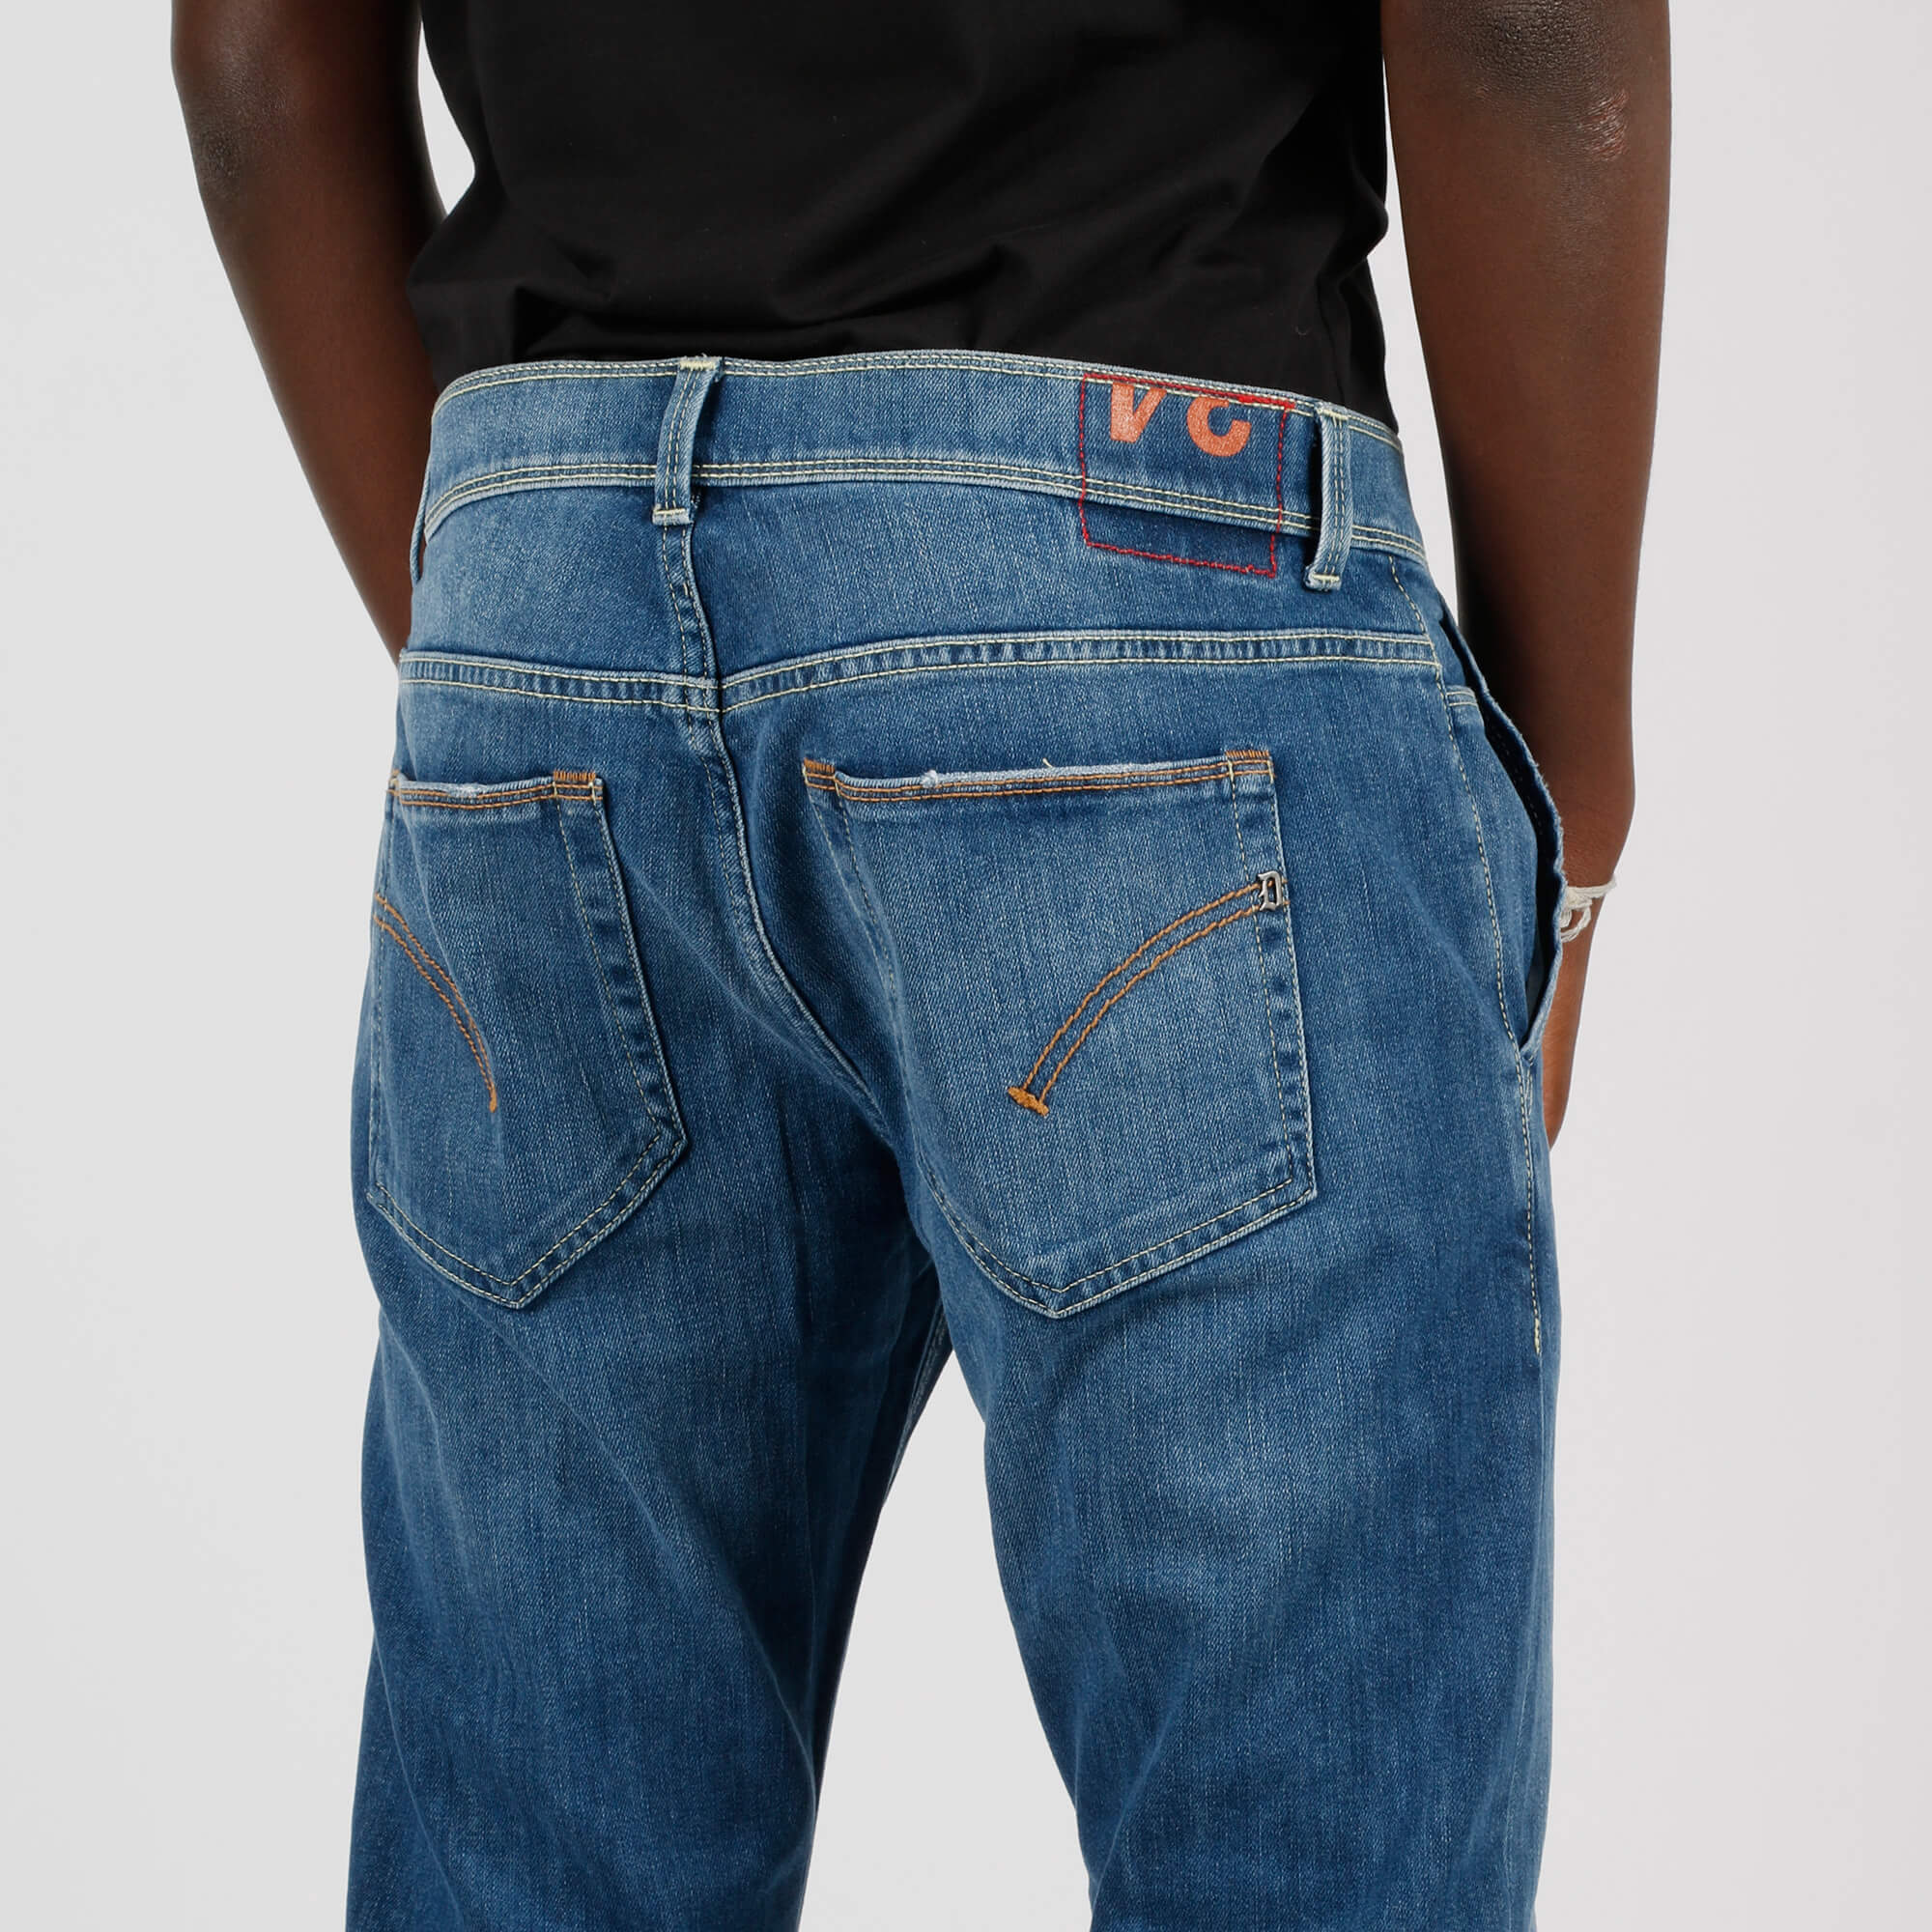 Jeans konor america - Denim